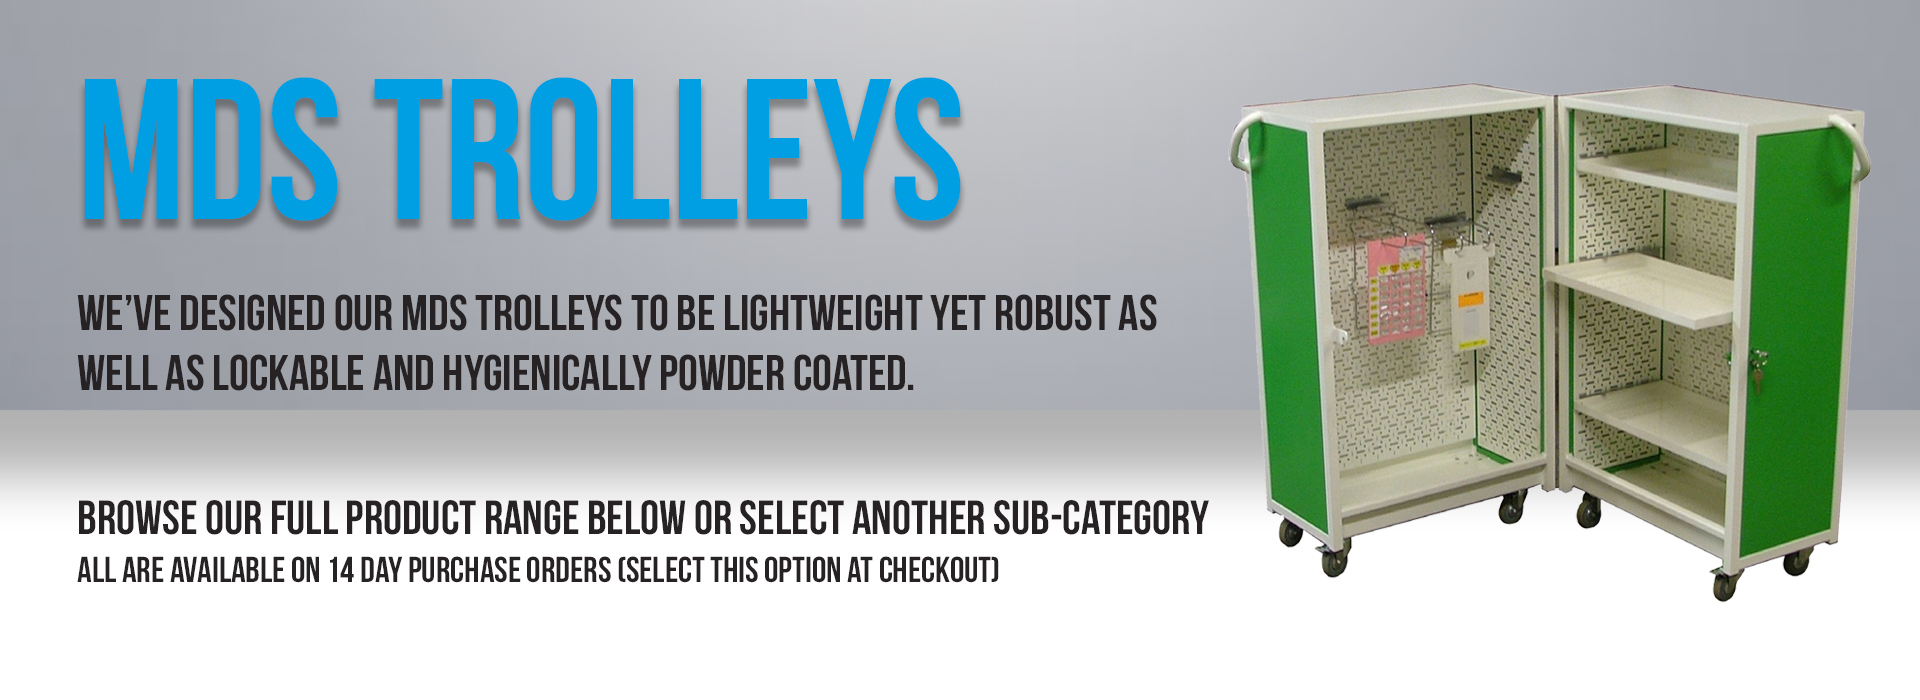 mds-trolleys-banner.jpg